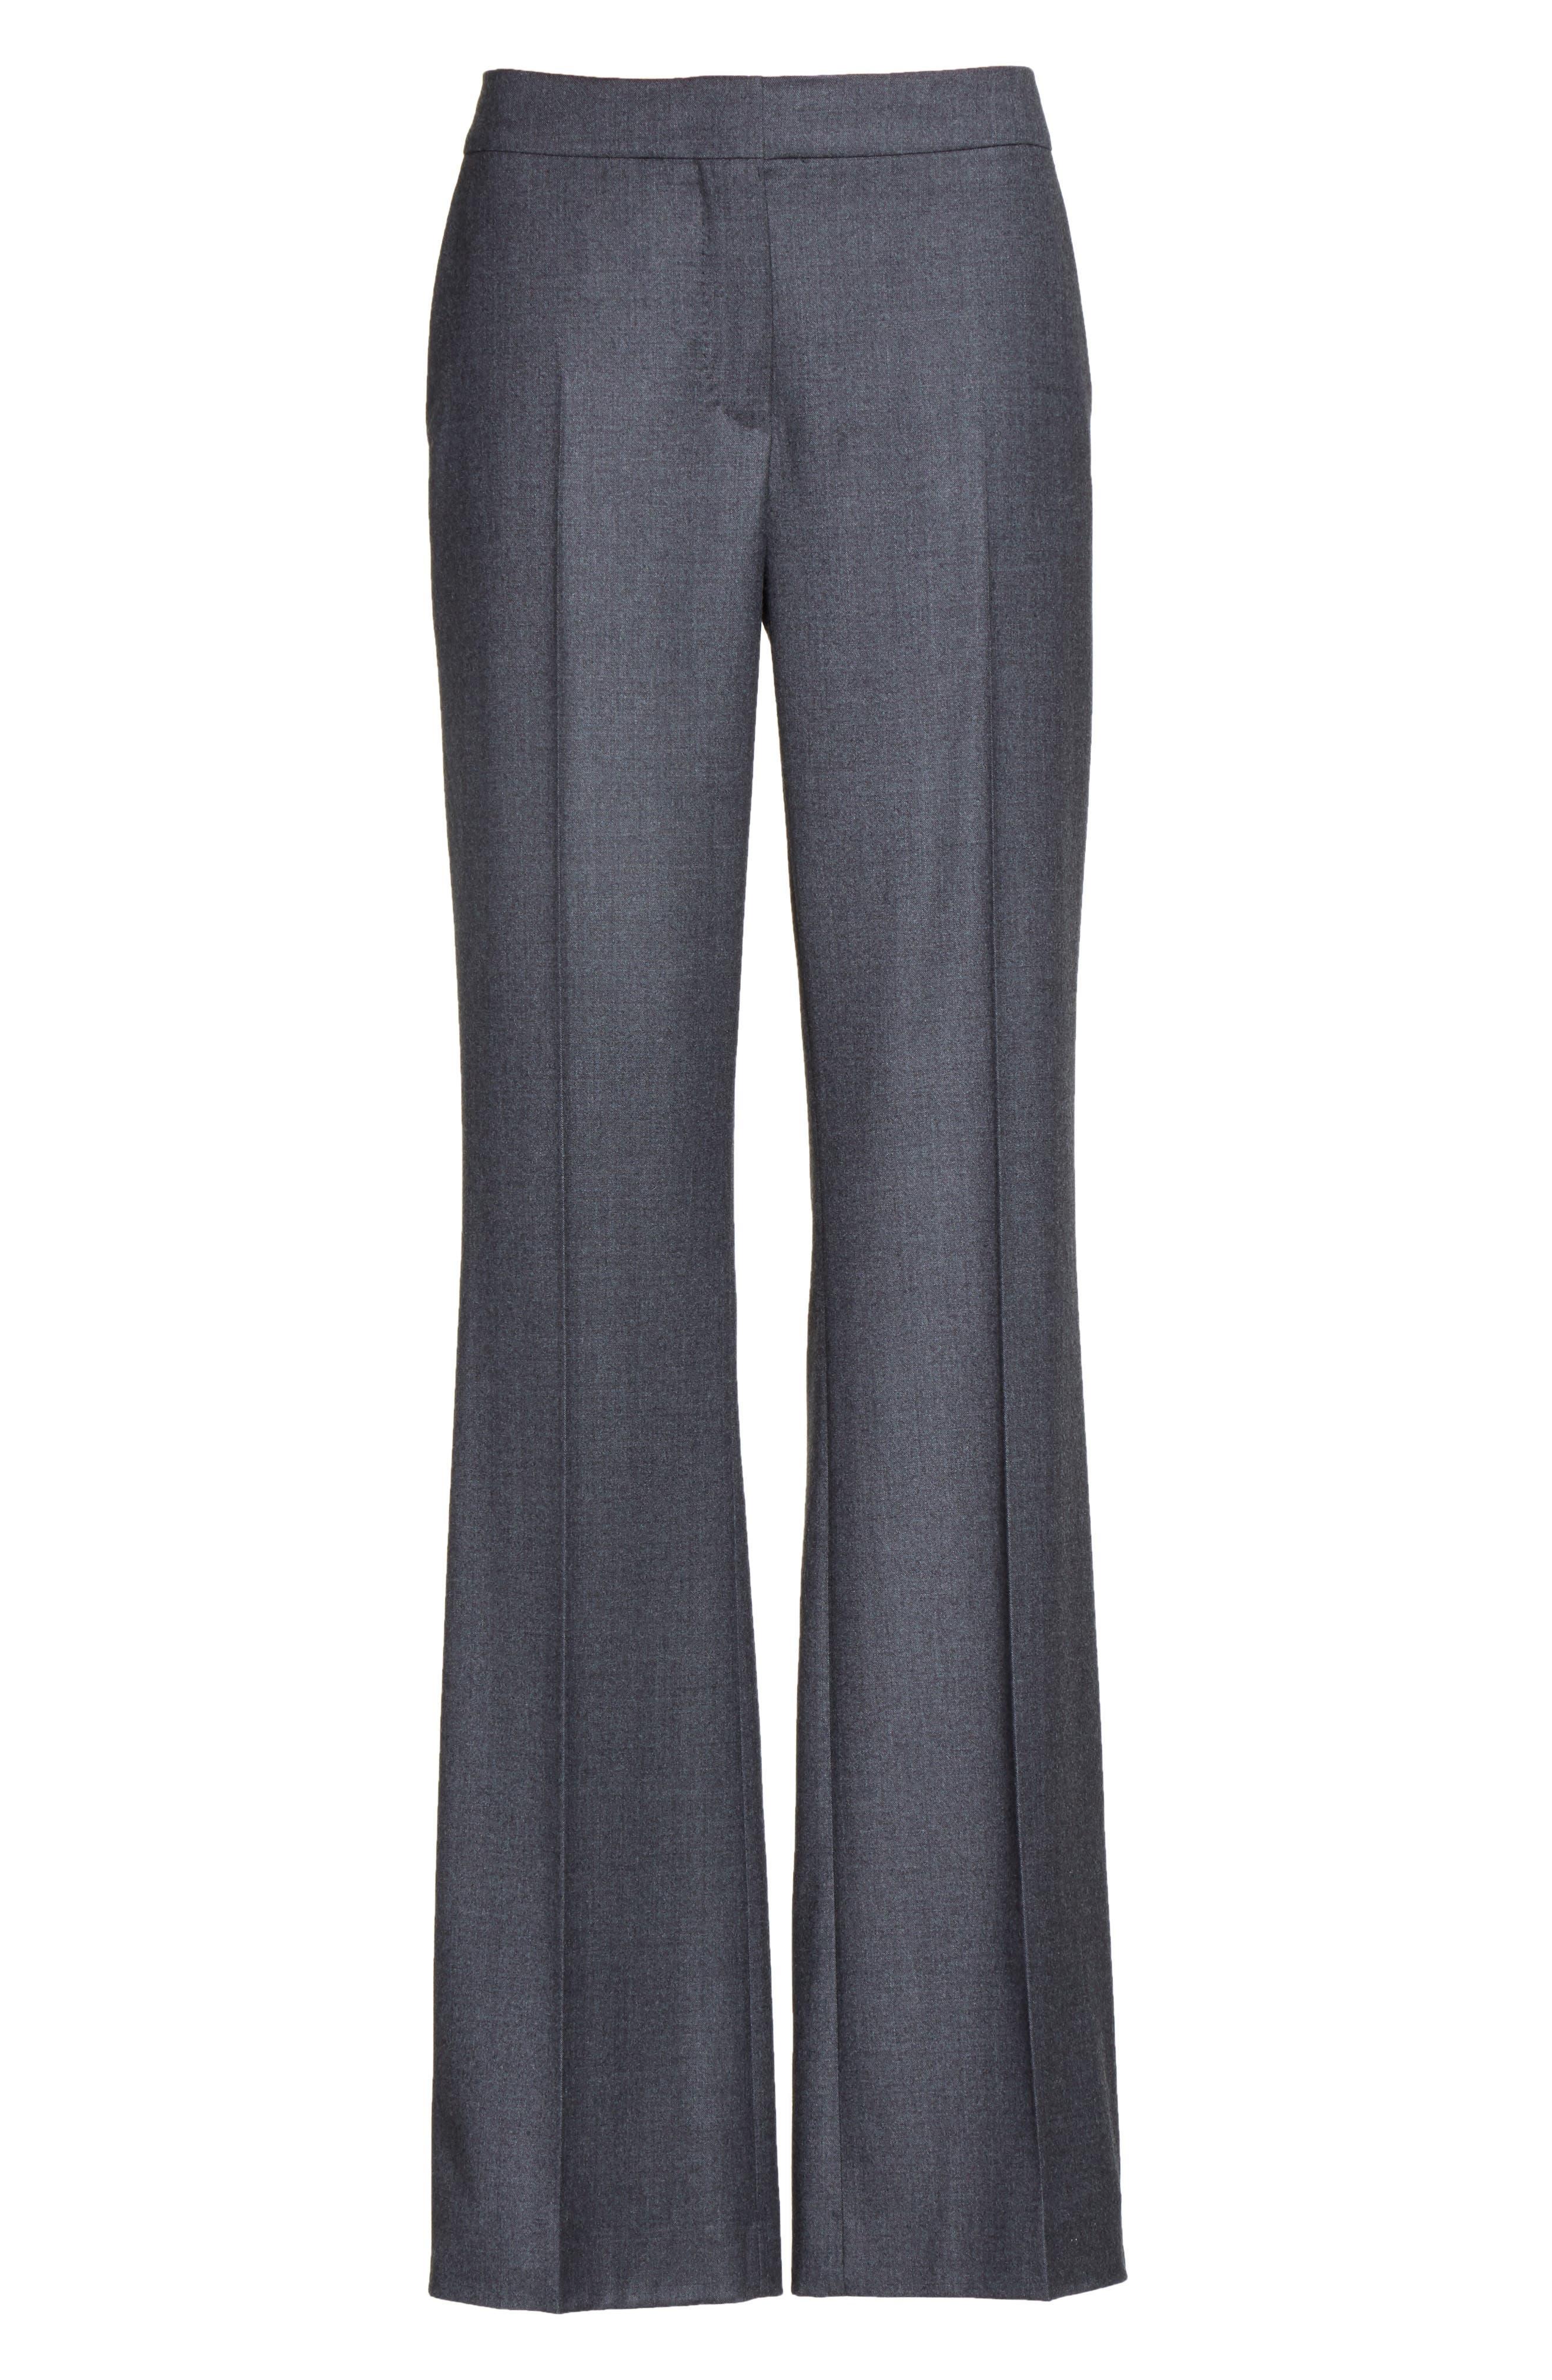 Pedone Wool Pants,                             Alternate thumbnail 8, color,                             Dark Grey